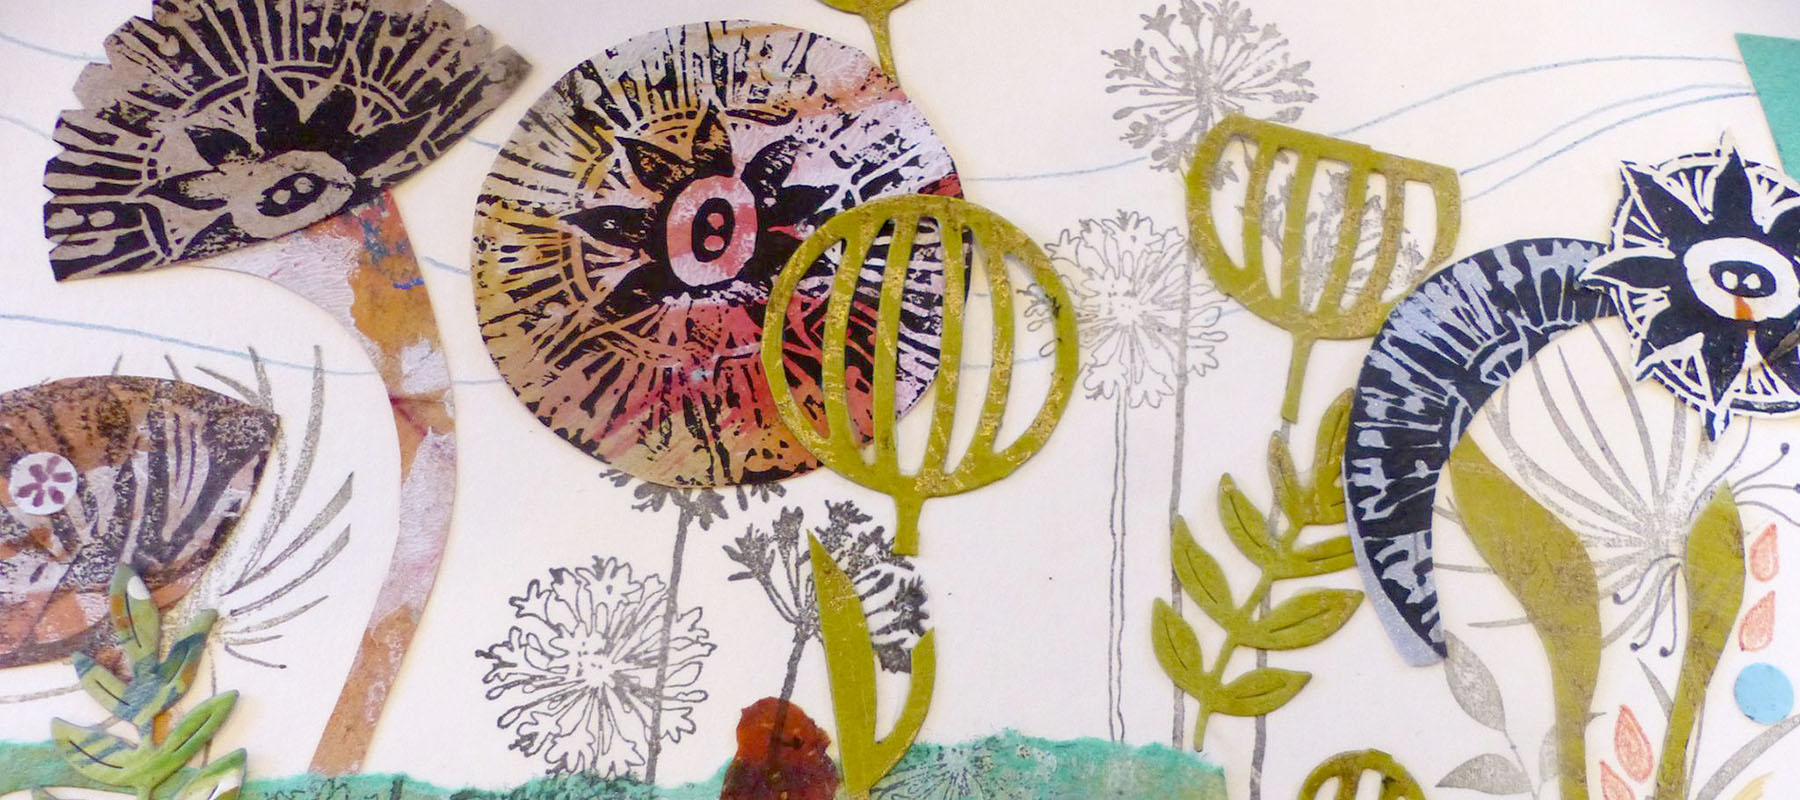 Jane Harlington Art Blue Pig Studio